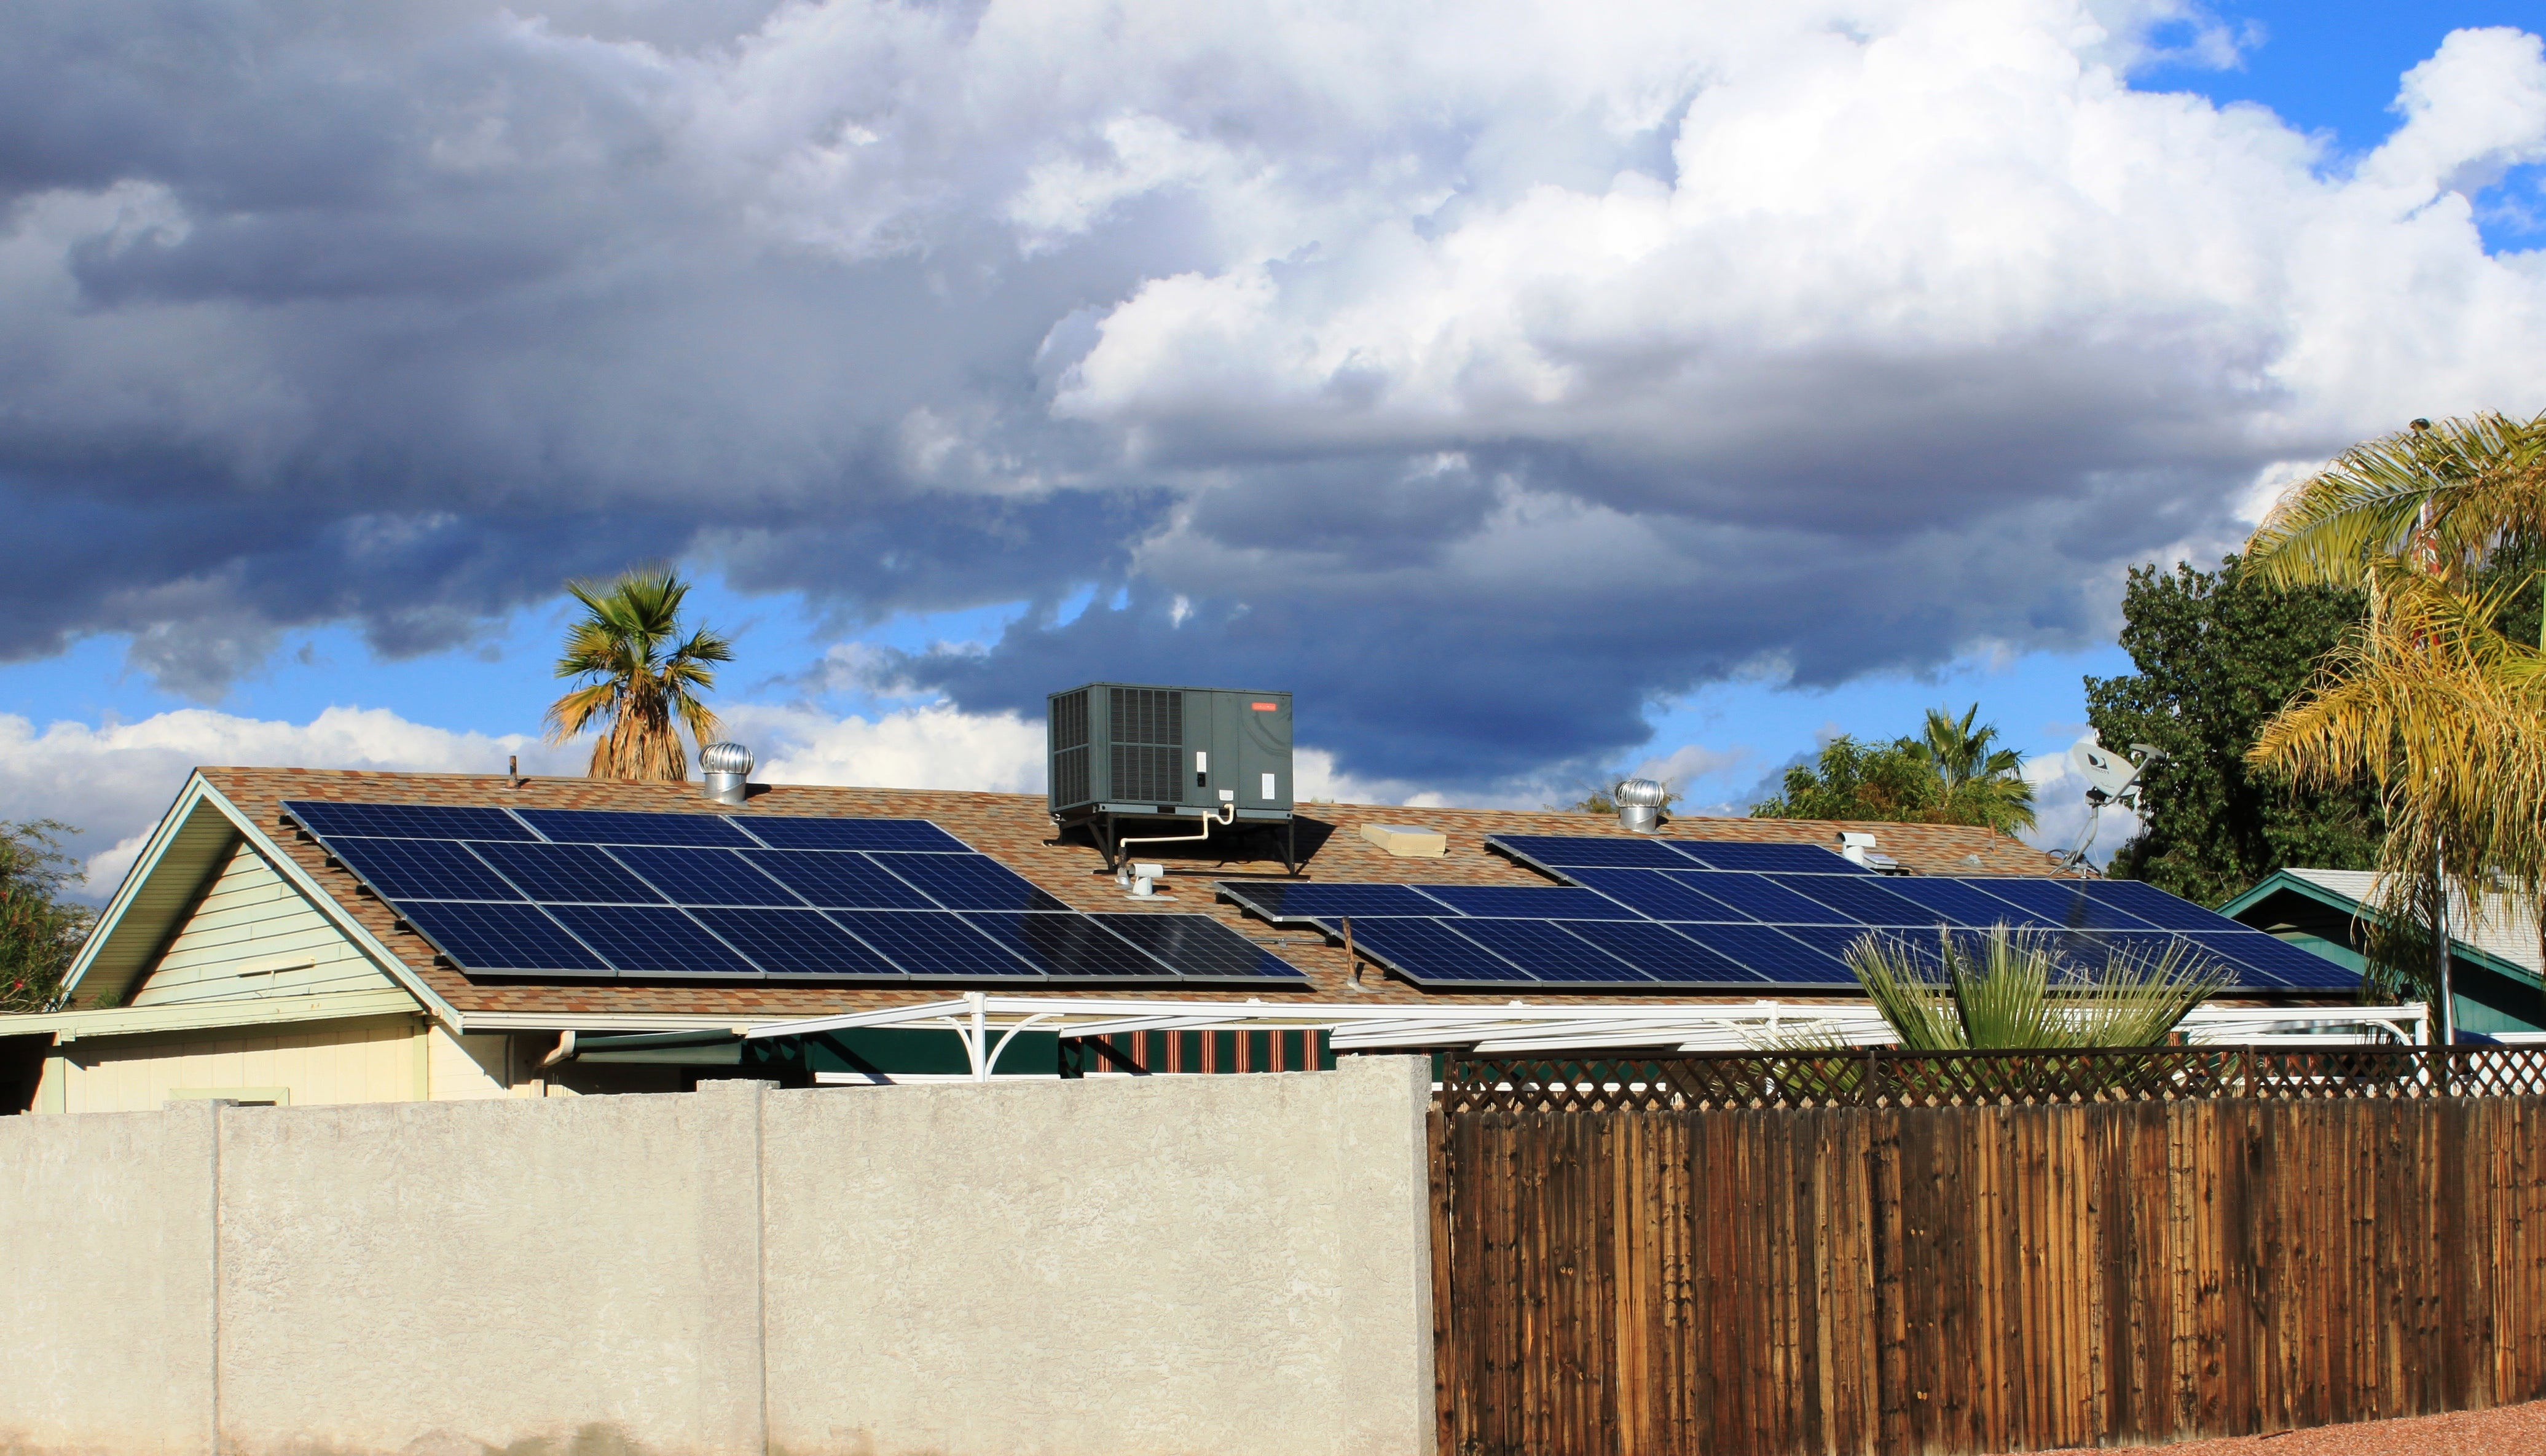 Tesla / SolarCity solar reviews, complaints, address & solar panels cost